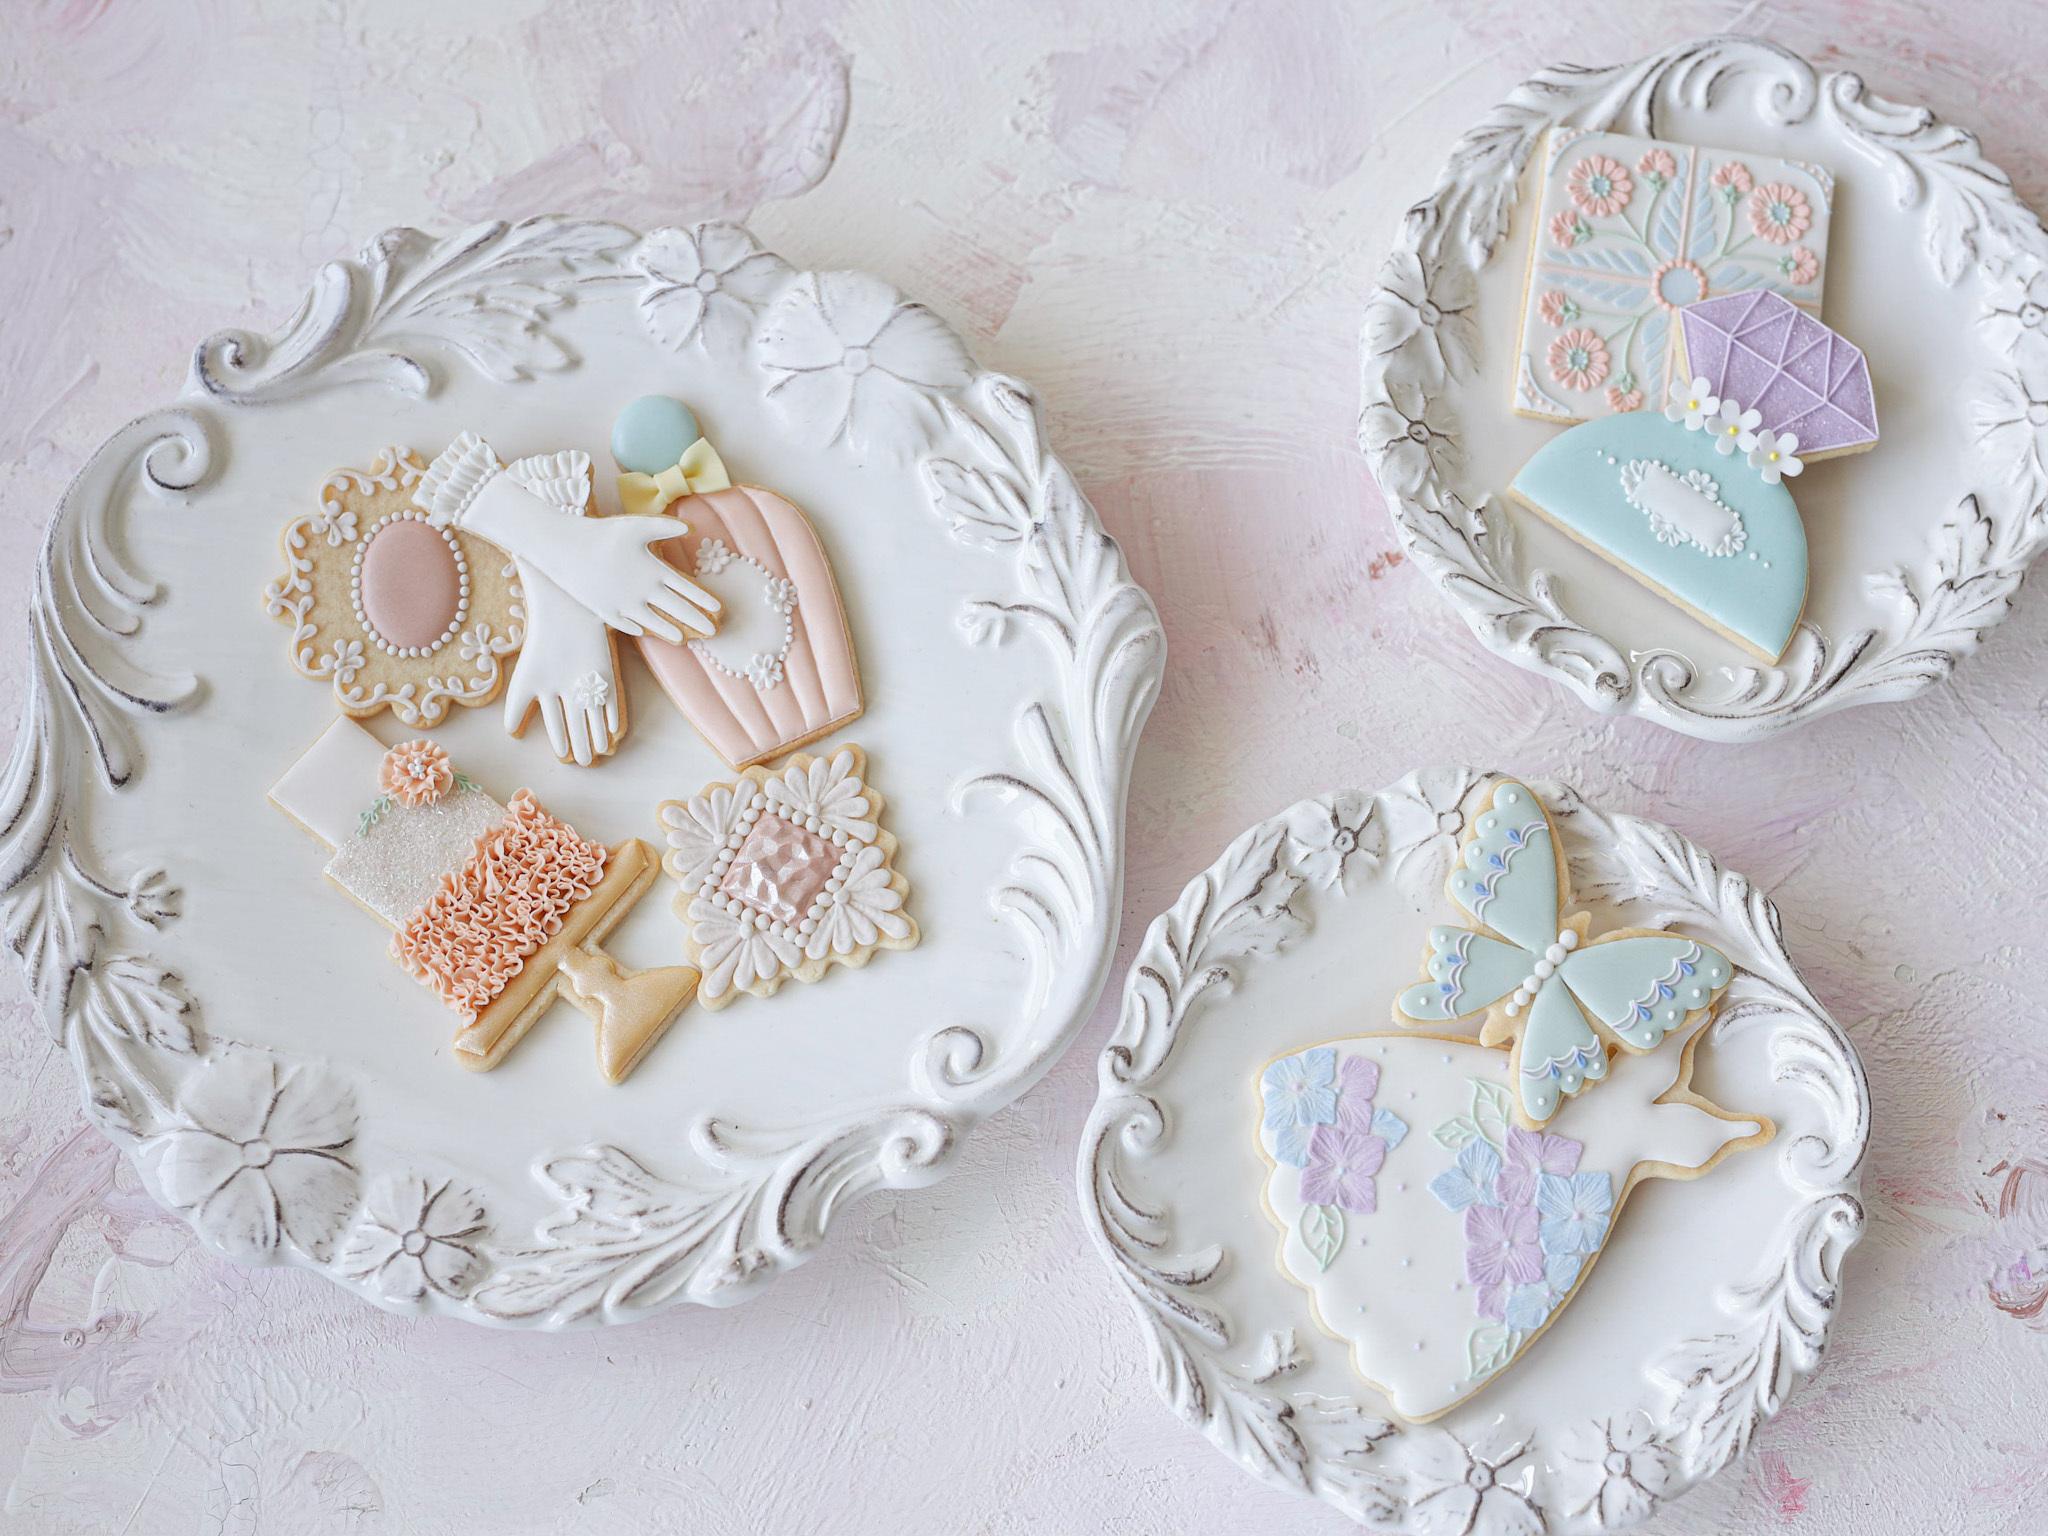 """Monthly"" cookie kit & video lesson April - September 第四週目月曜日発送"